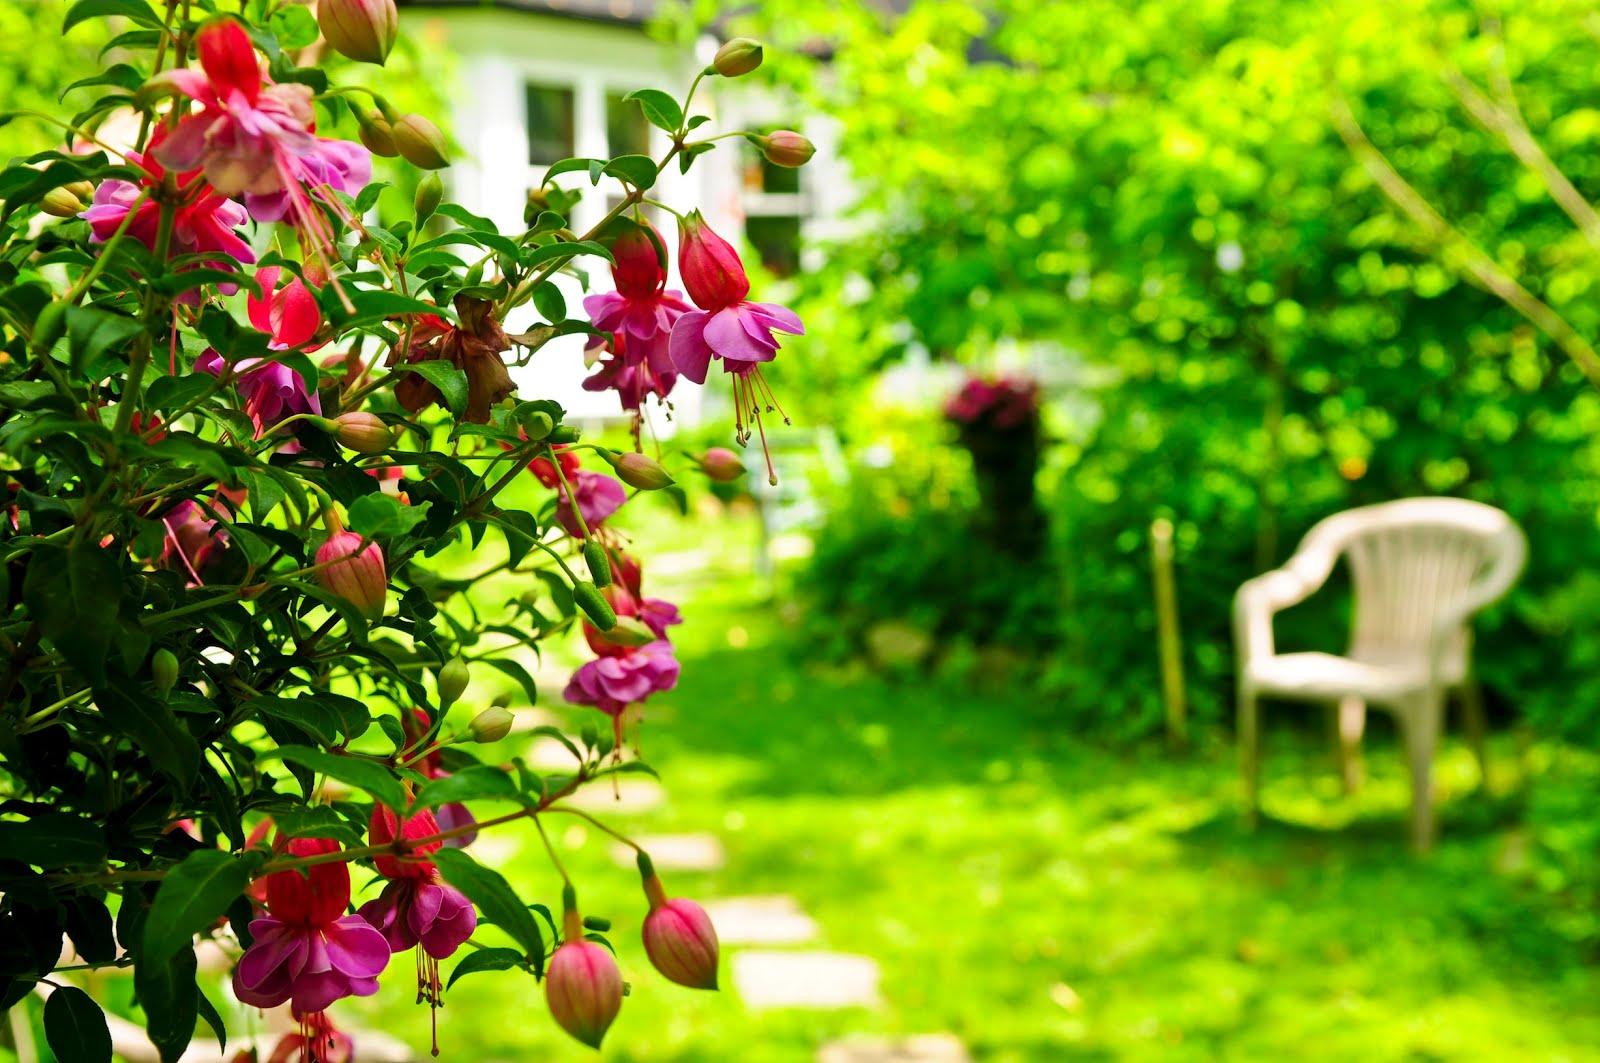 August 2012 august 2012 banco de imagenes gratuitas for Plantas perennes para jardin